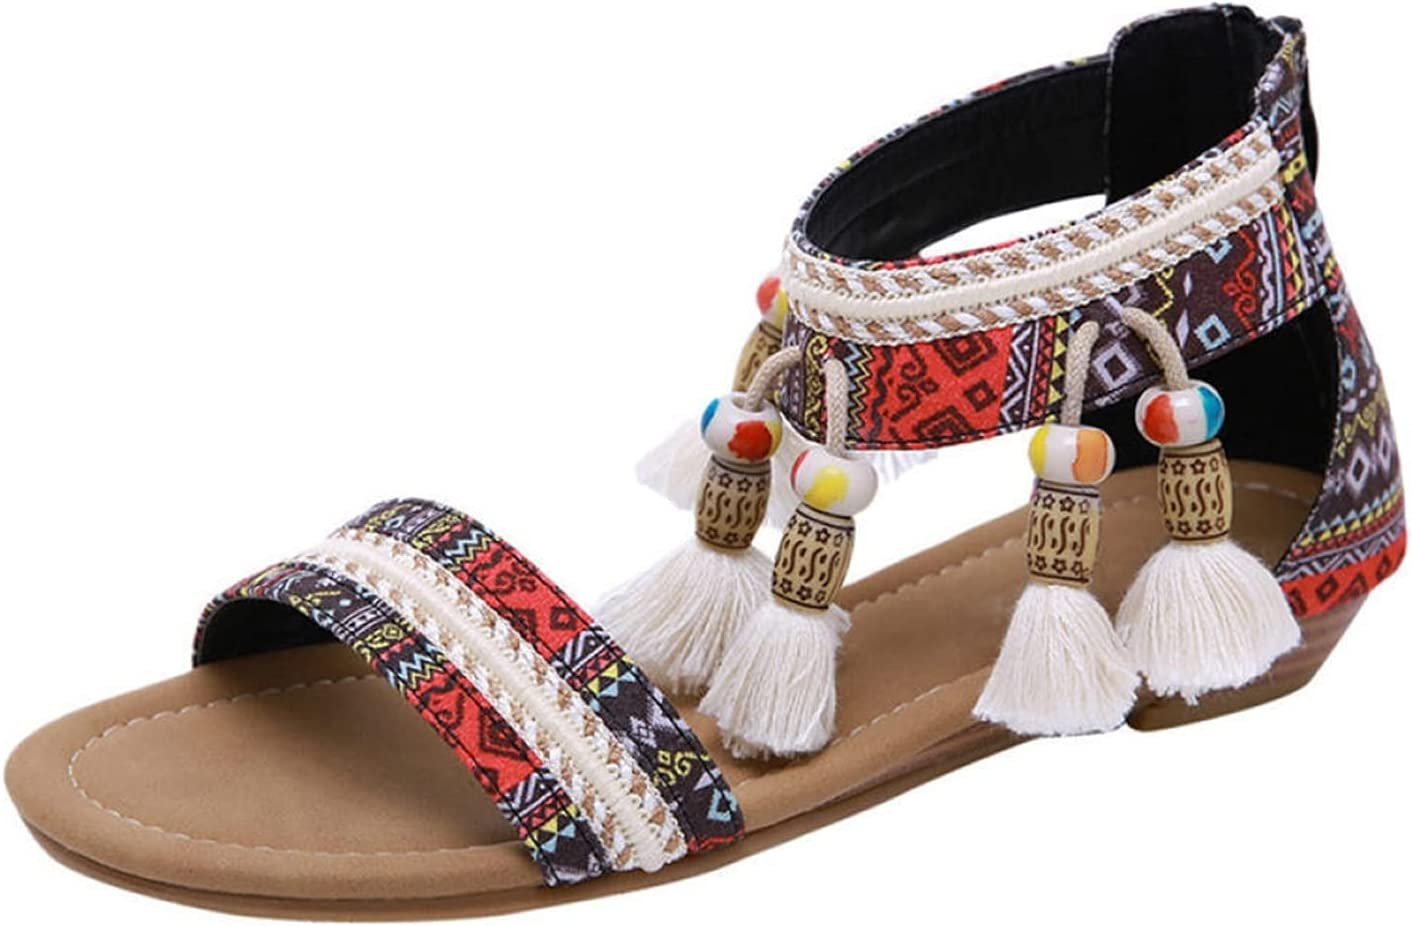 LYNLYN Sandals Ladies Sandals Summer Ladies Bohemian Style Flat Shoes Women Sandals Rhinestone Sandals Beach Comfortable Slippers Ladies Sandals (Color : Black, Size : 6)